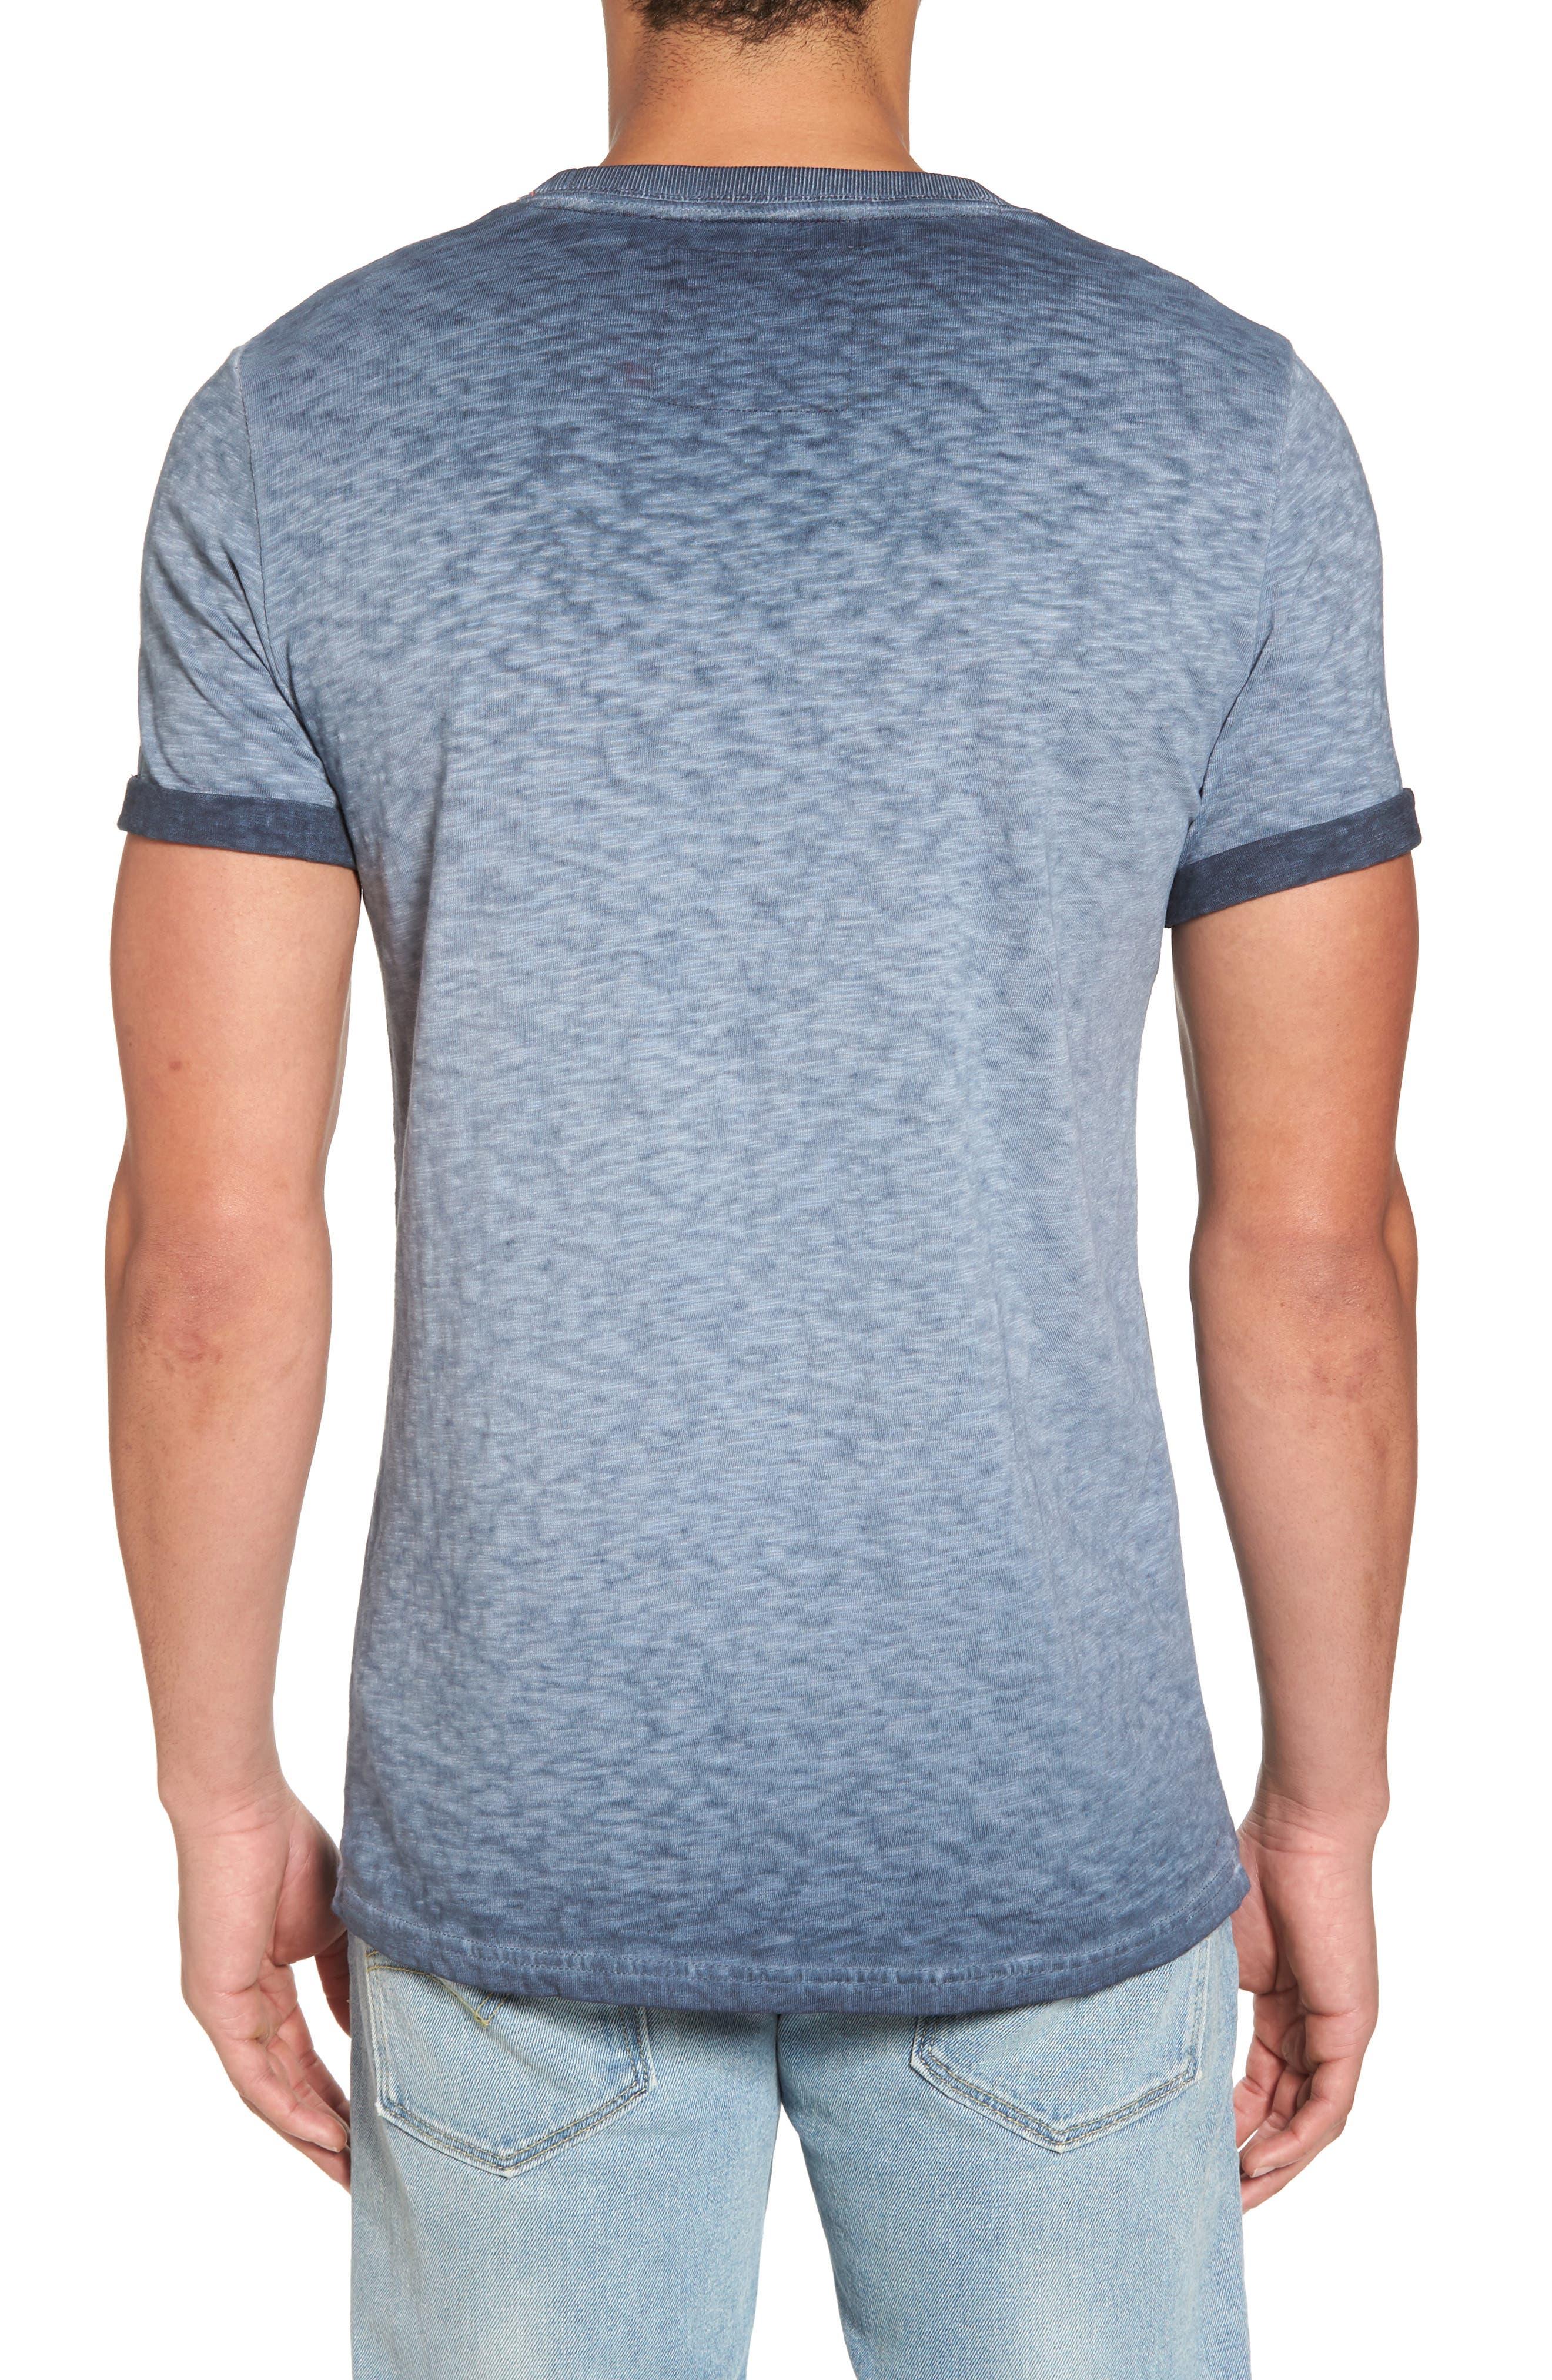 Orange Label Low Roller T-Shirt,                             Alternate thumbnail 7, color,